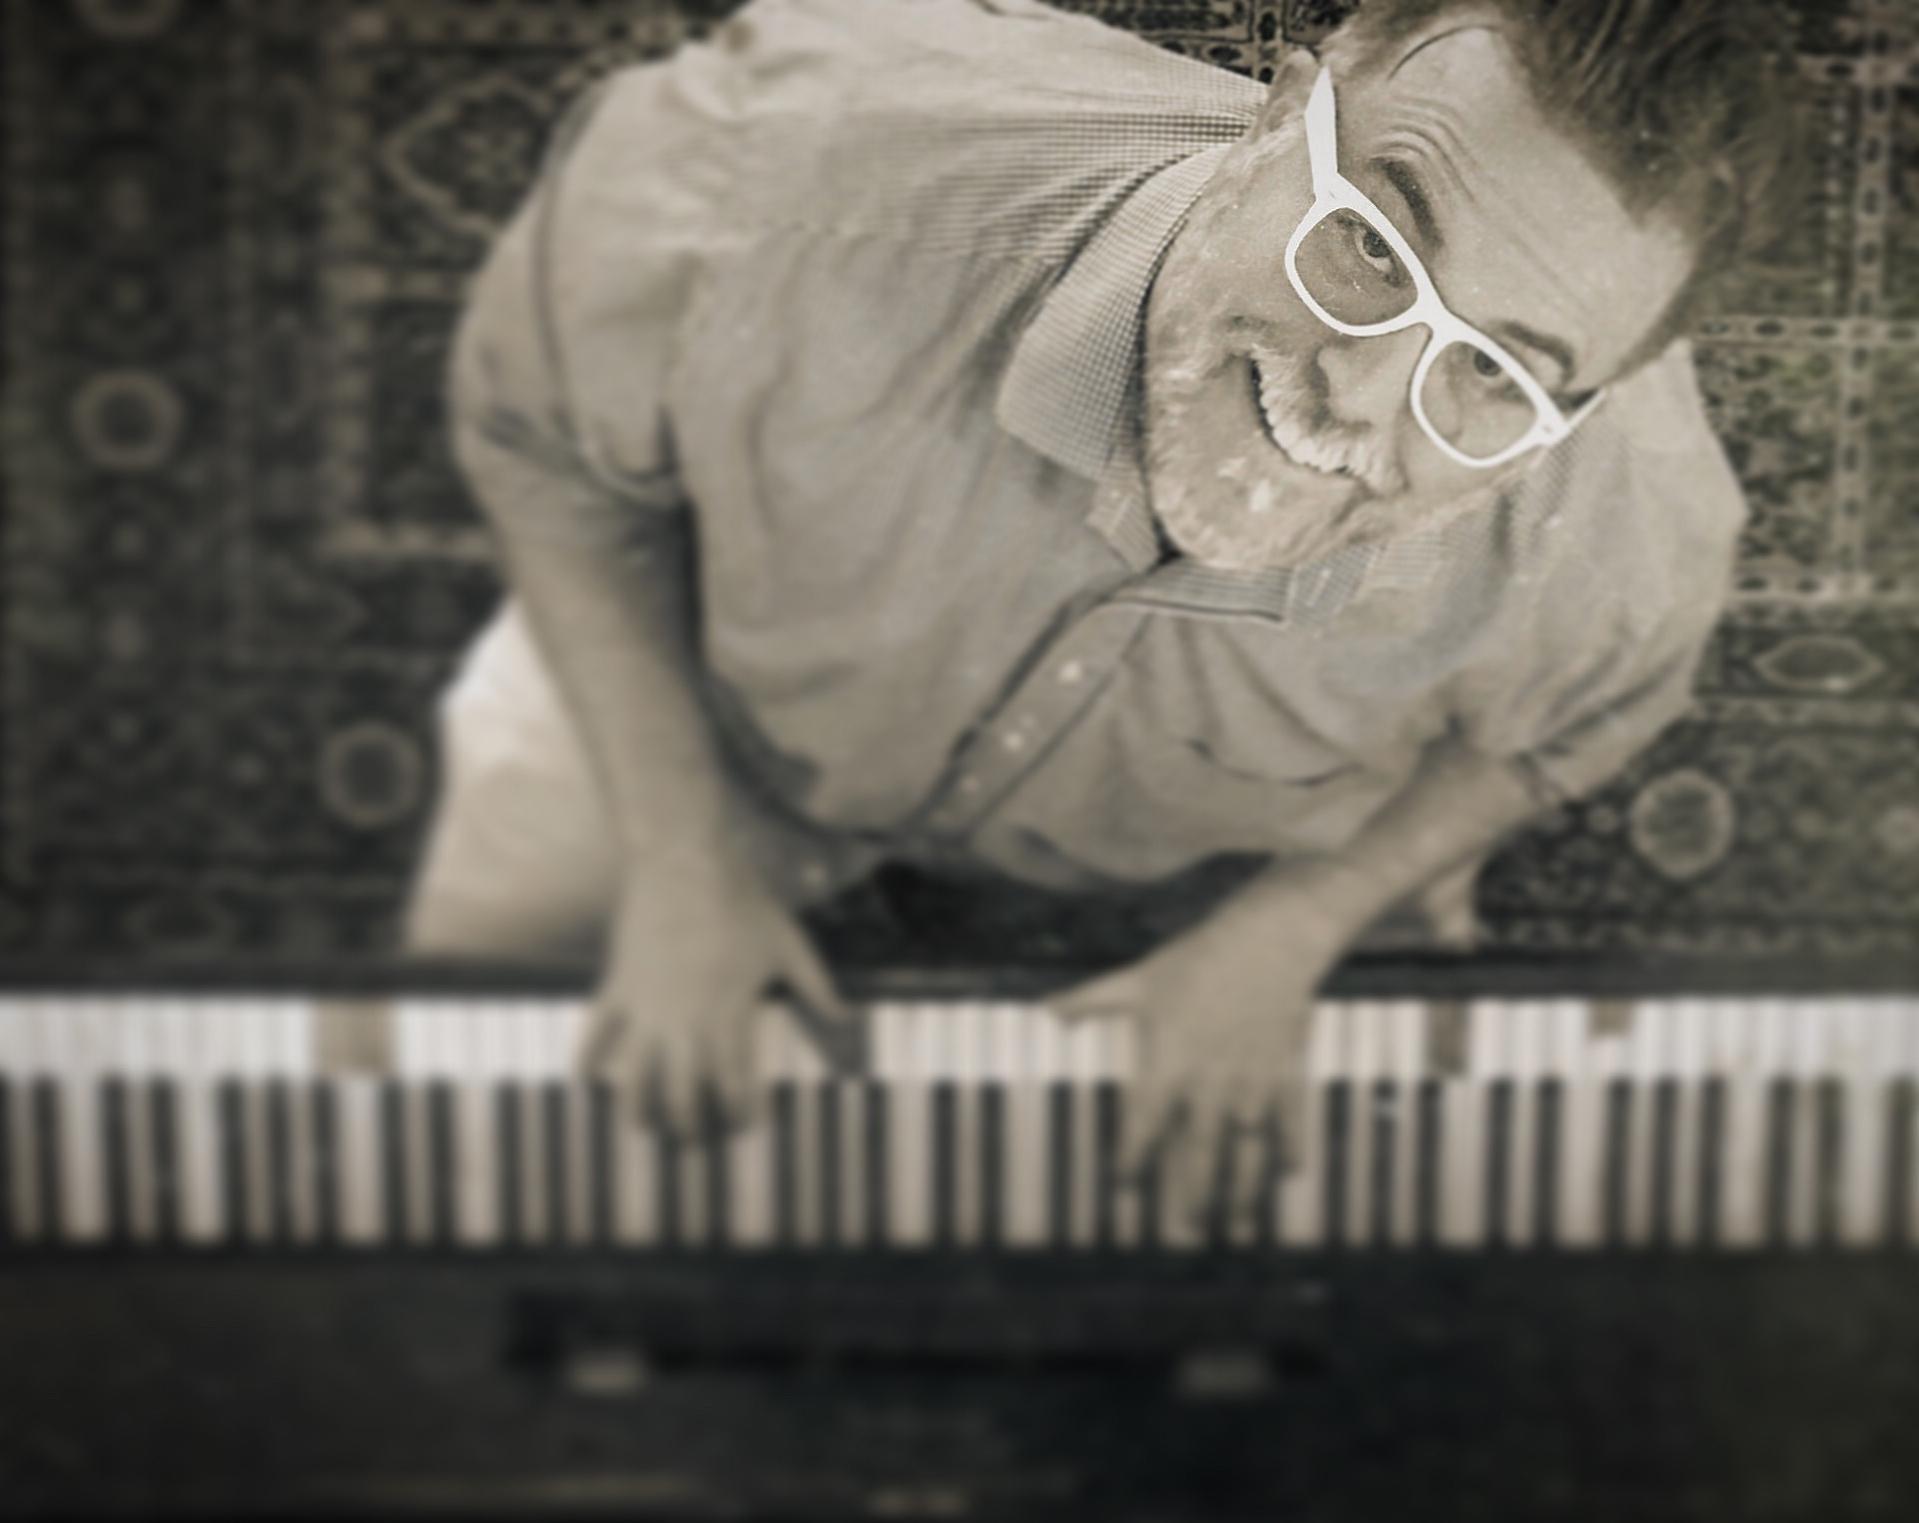 Haddon Kime - Composer, Lyricist, and Sound Designer